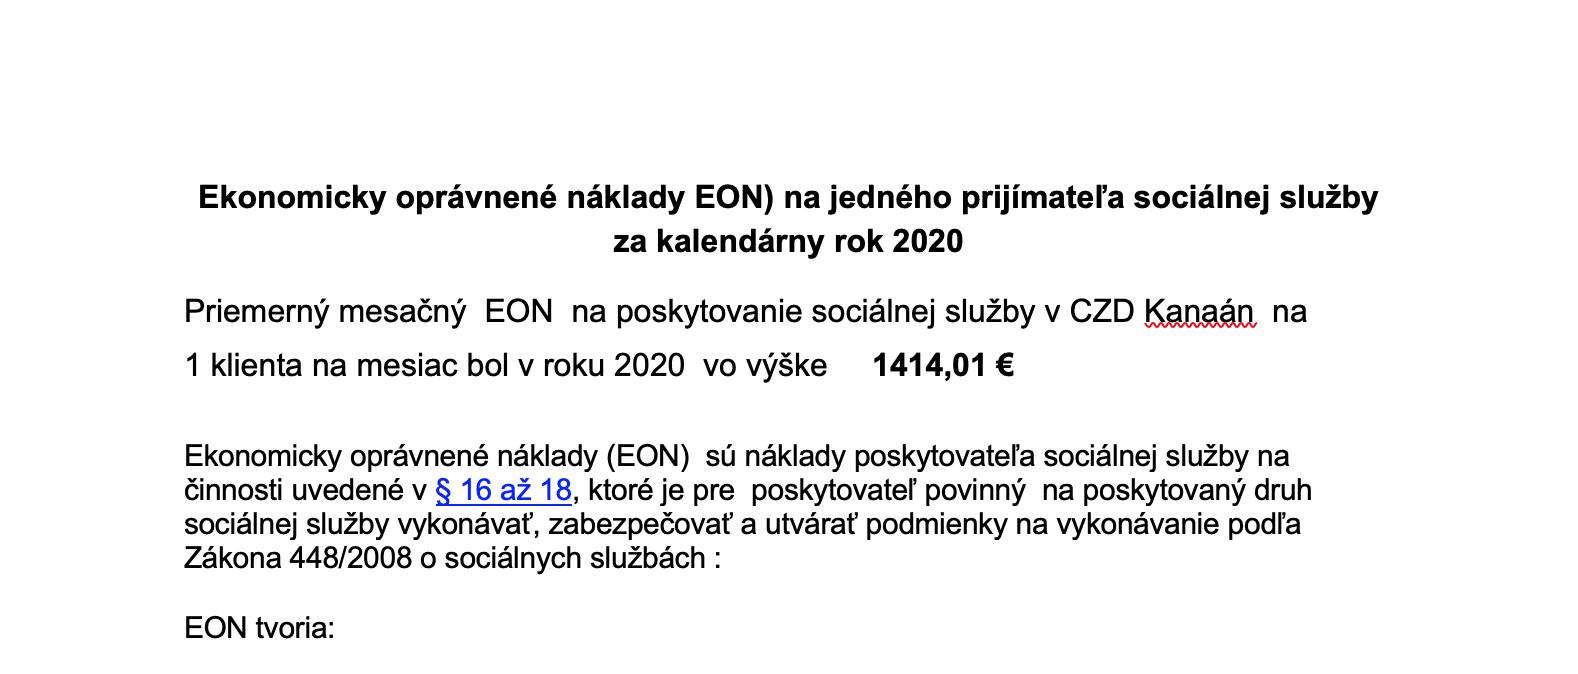 Ekonomicky oprávnené náklady EON za rok 2020